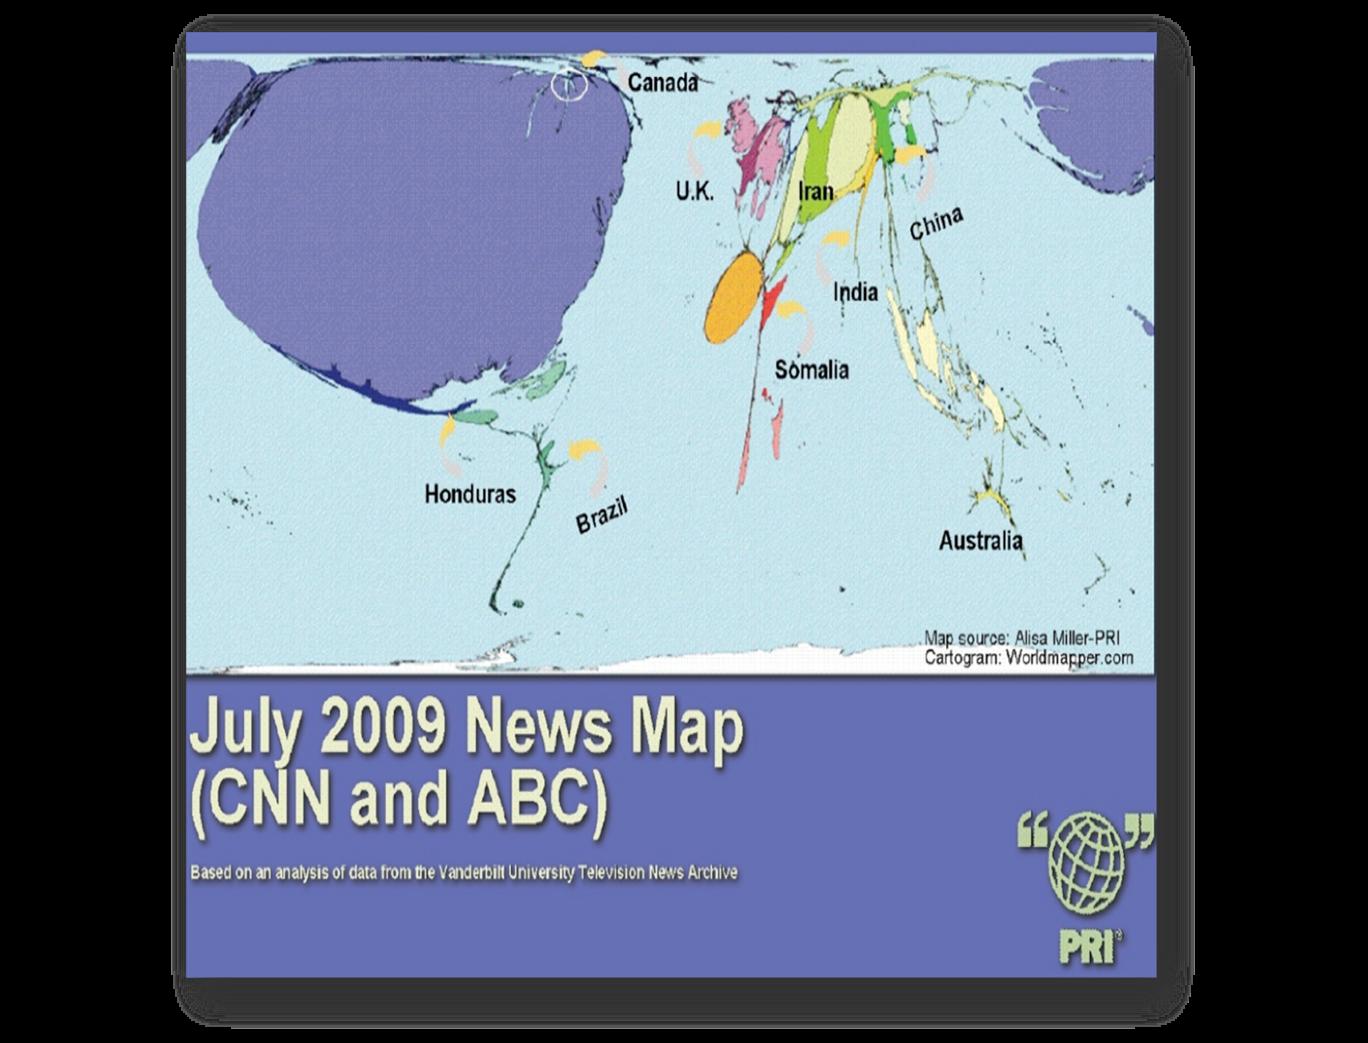 newsmap pulitzer